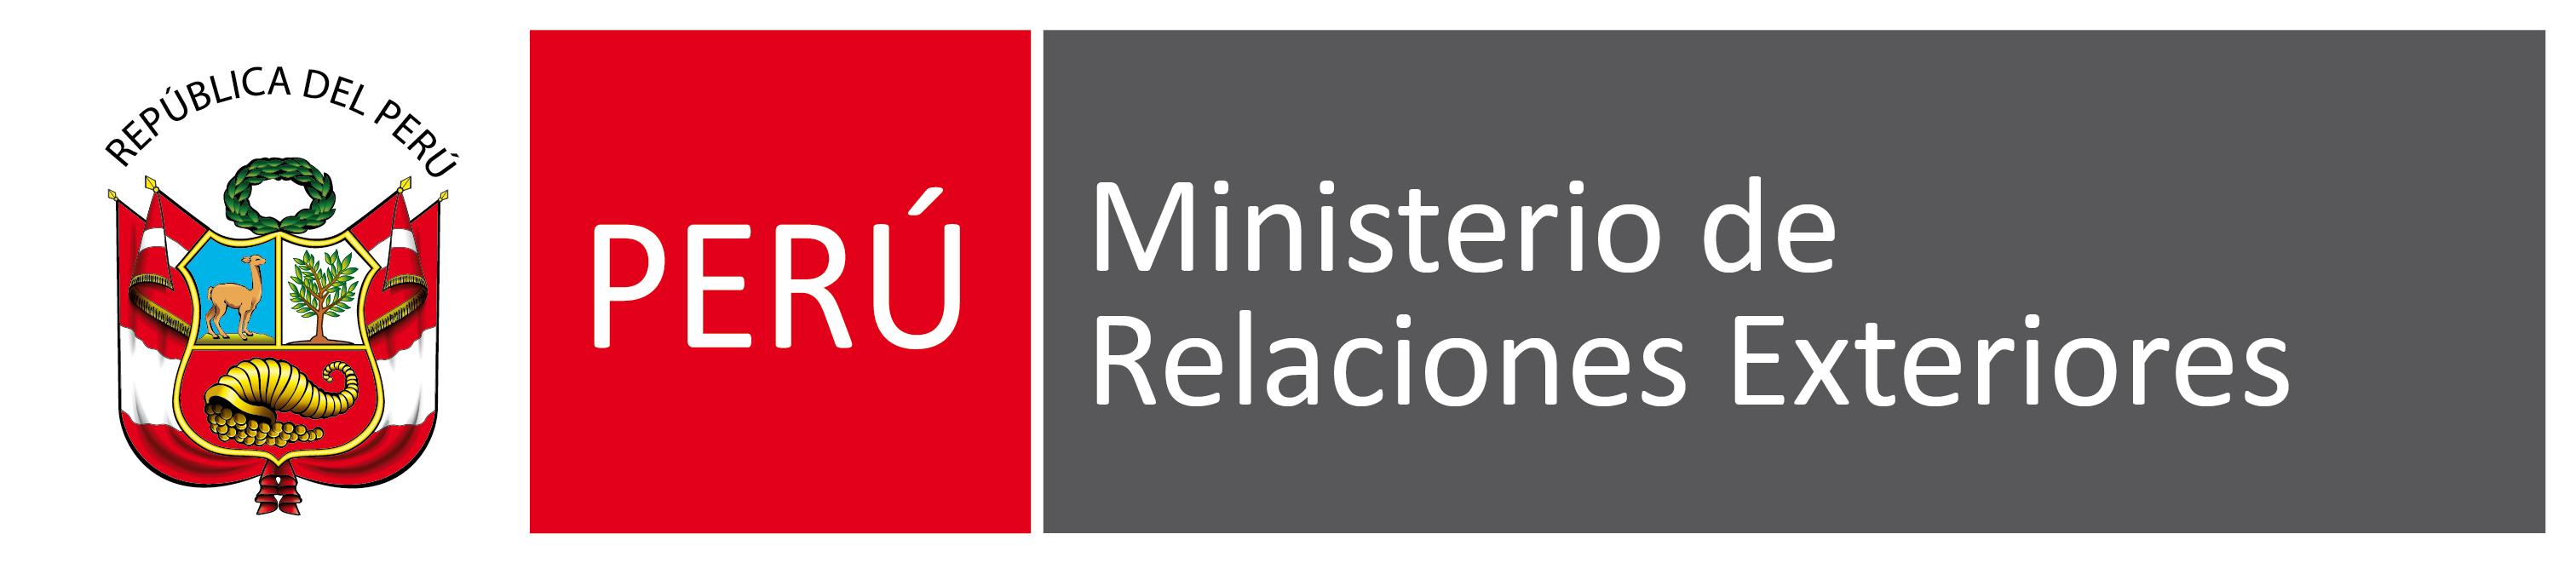 Logo Ministerio de Relaciones Exteriores